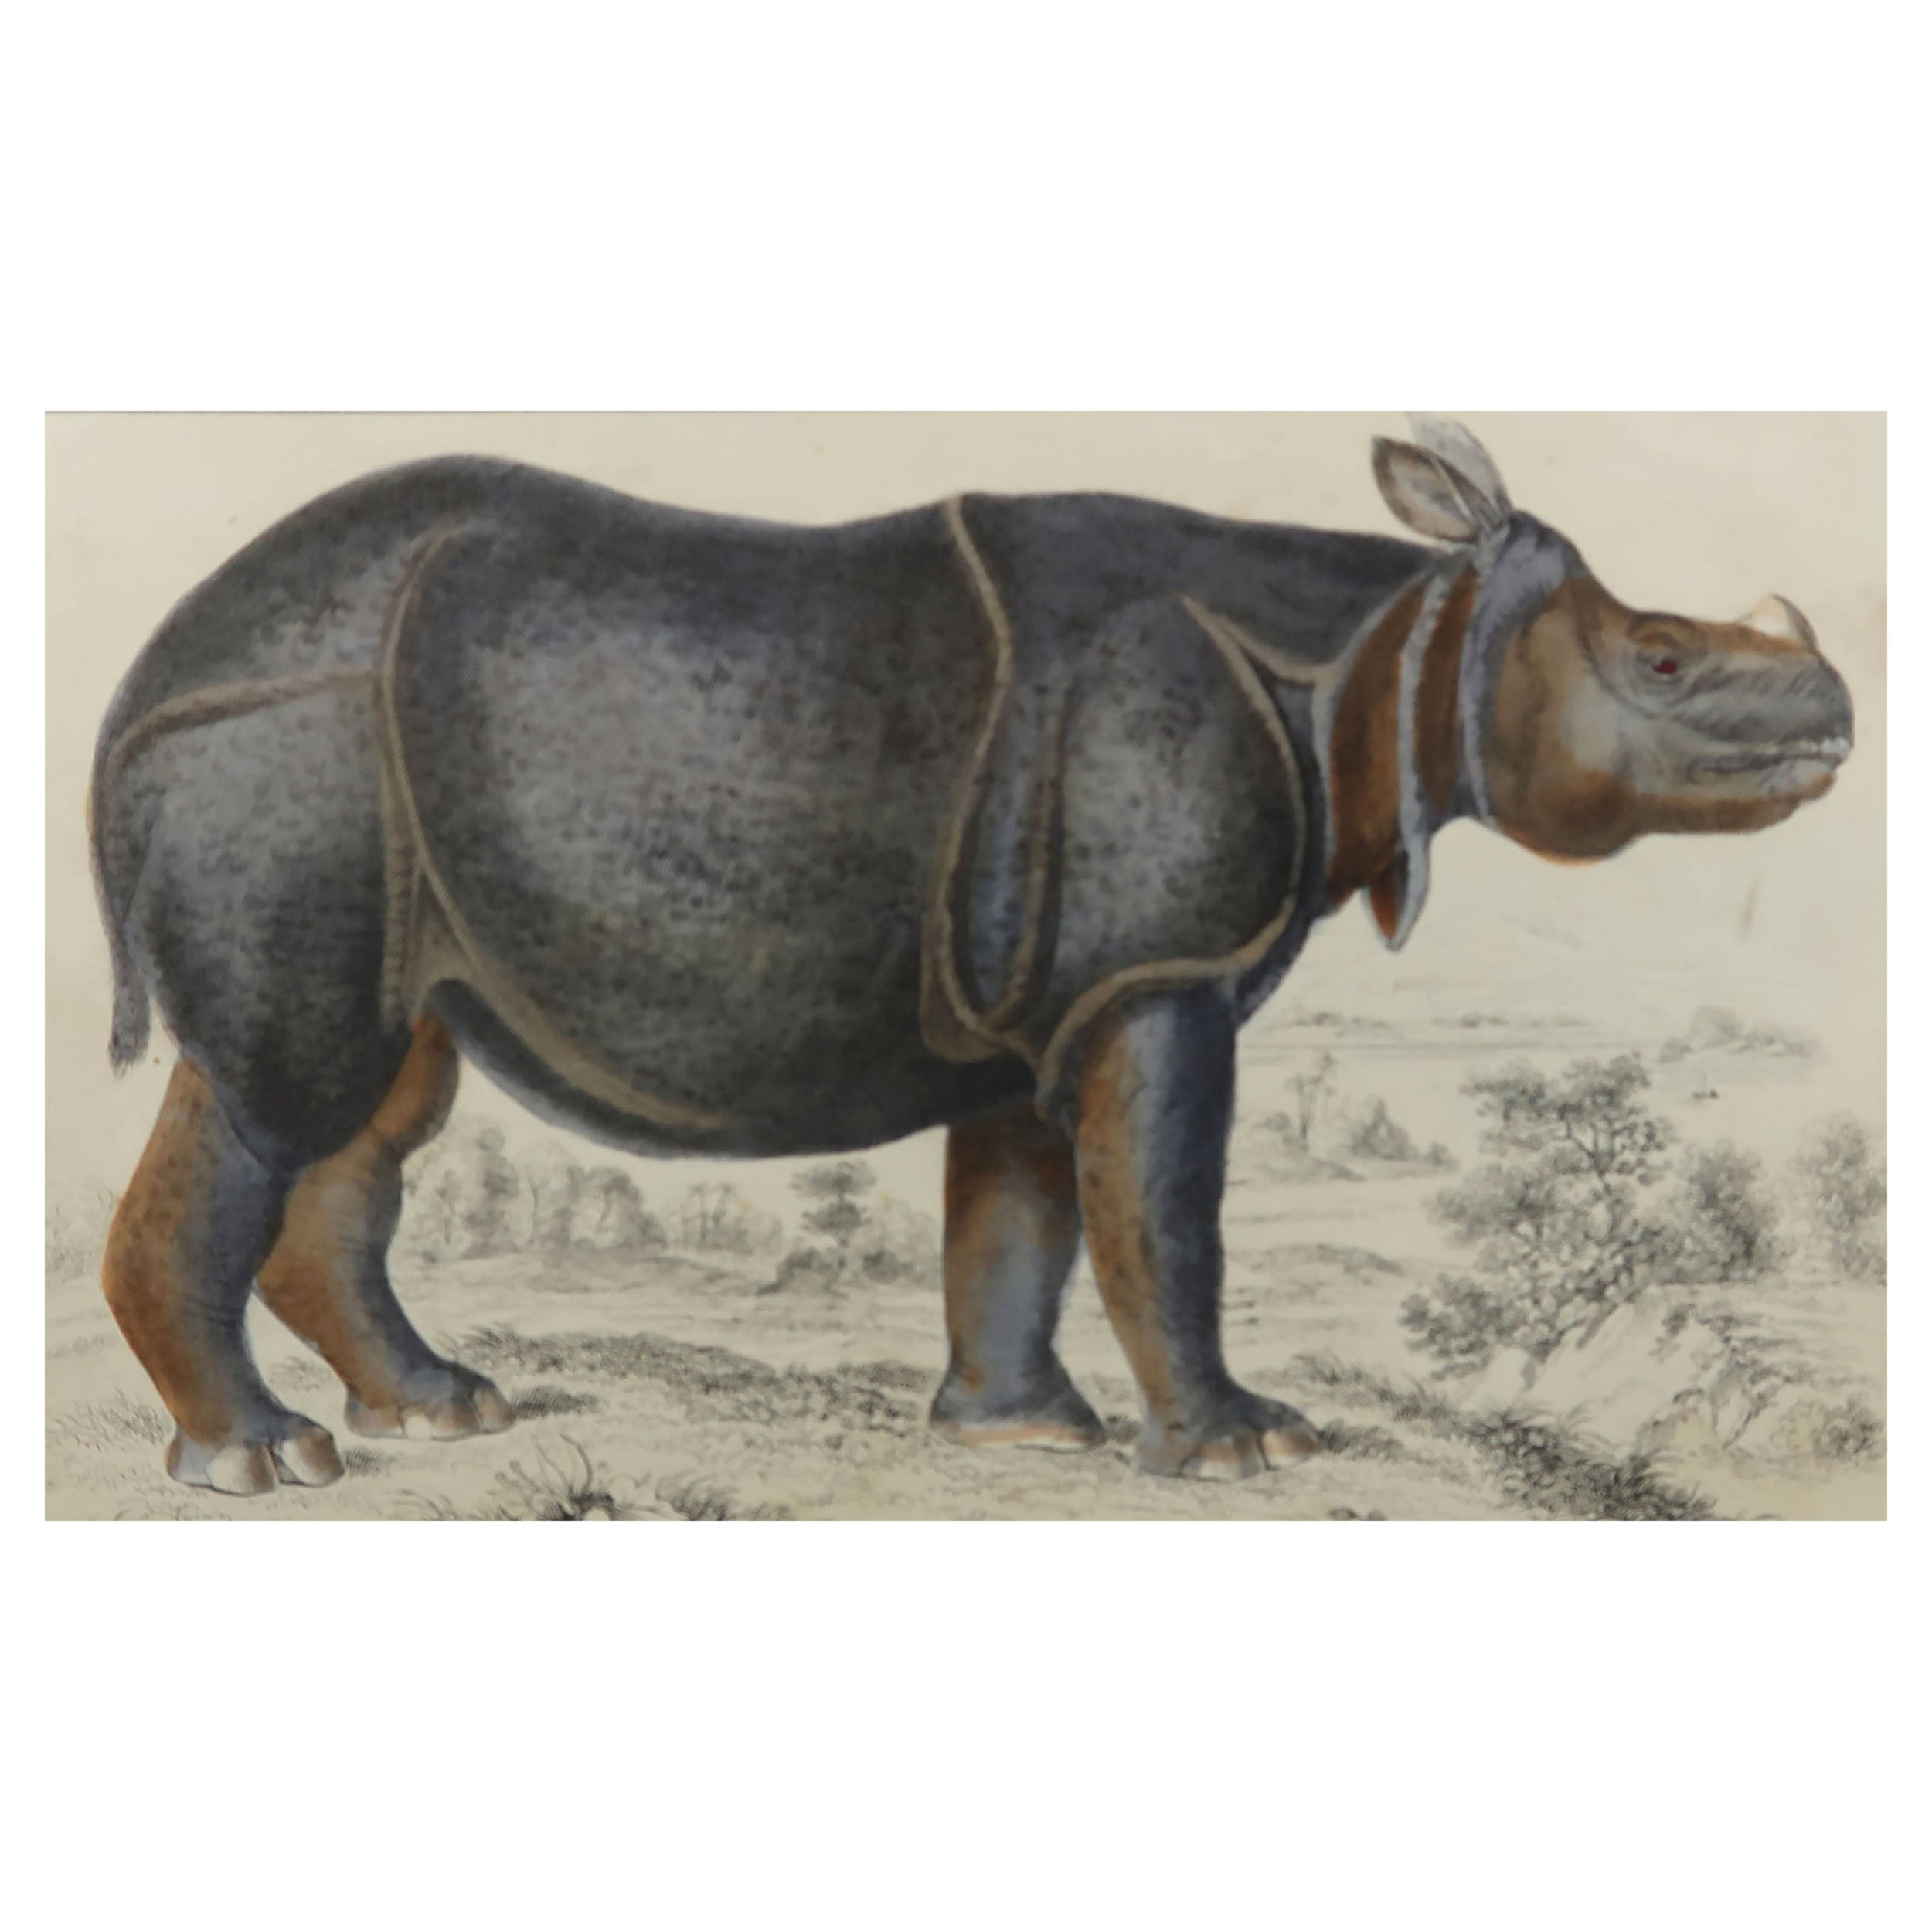 Original Antique Print of a Rhinoceros, 1847 'Unframed'